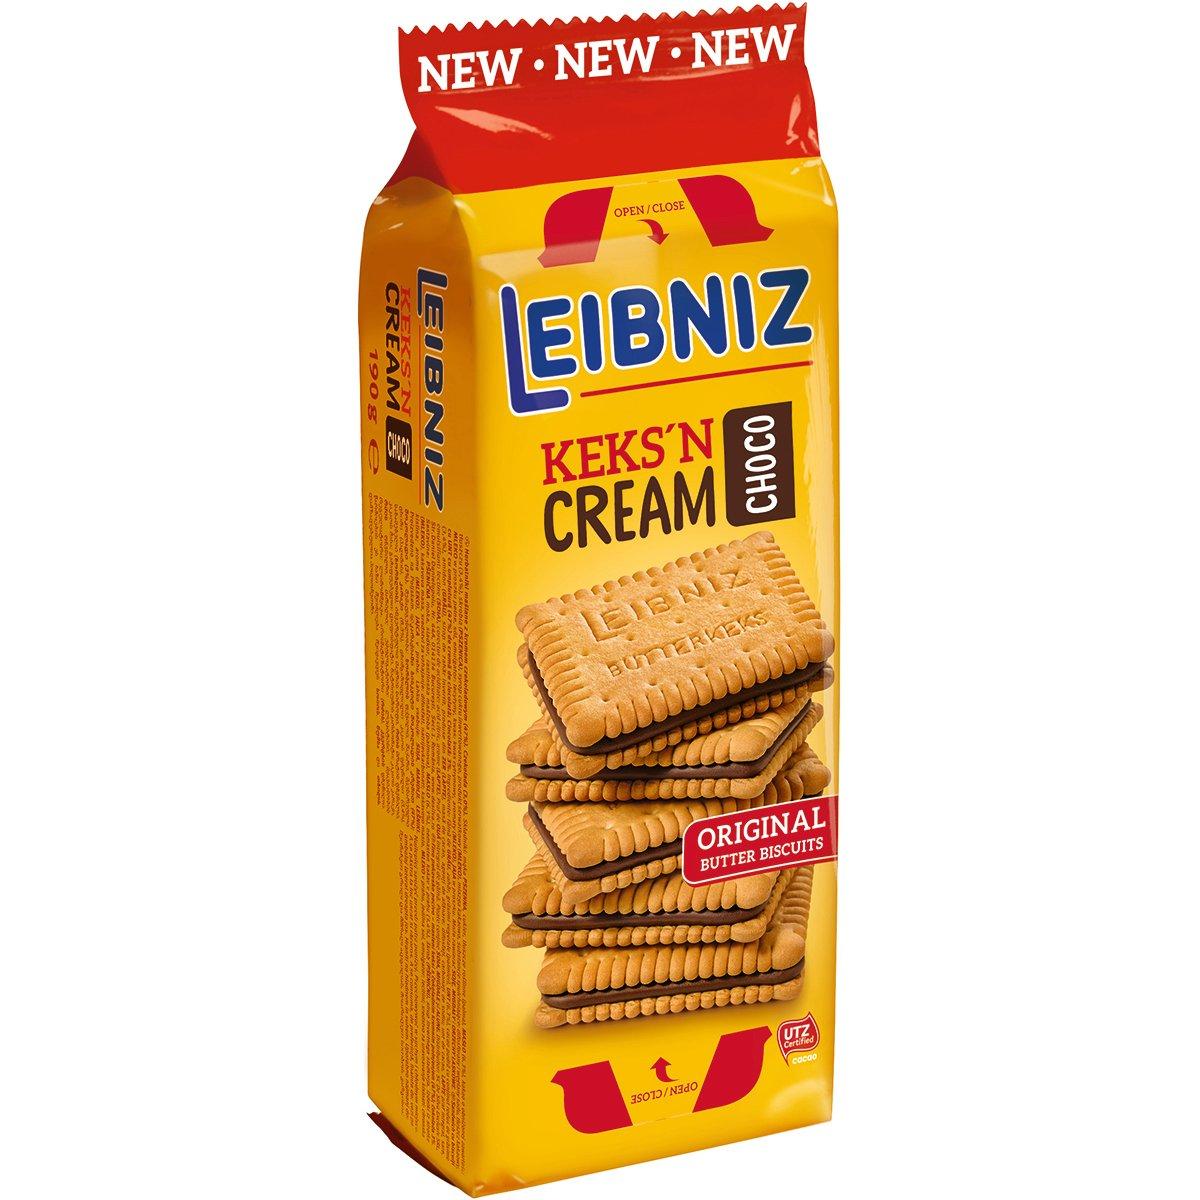 Biscuiti cu crema de cacao Leibniz, 190 g imagine